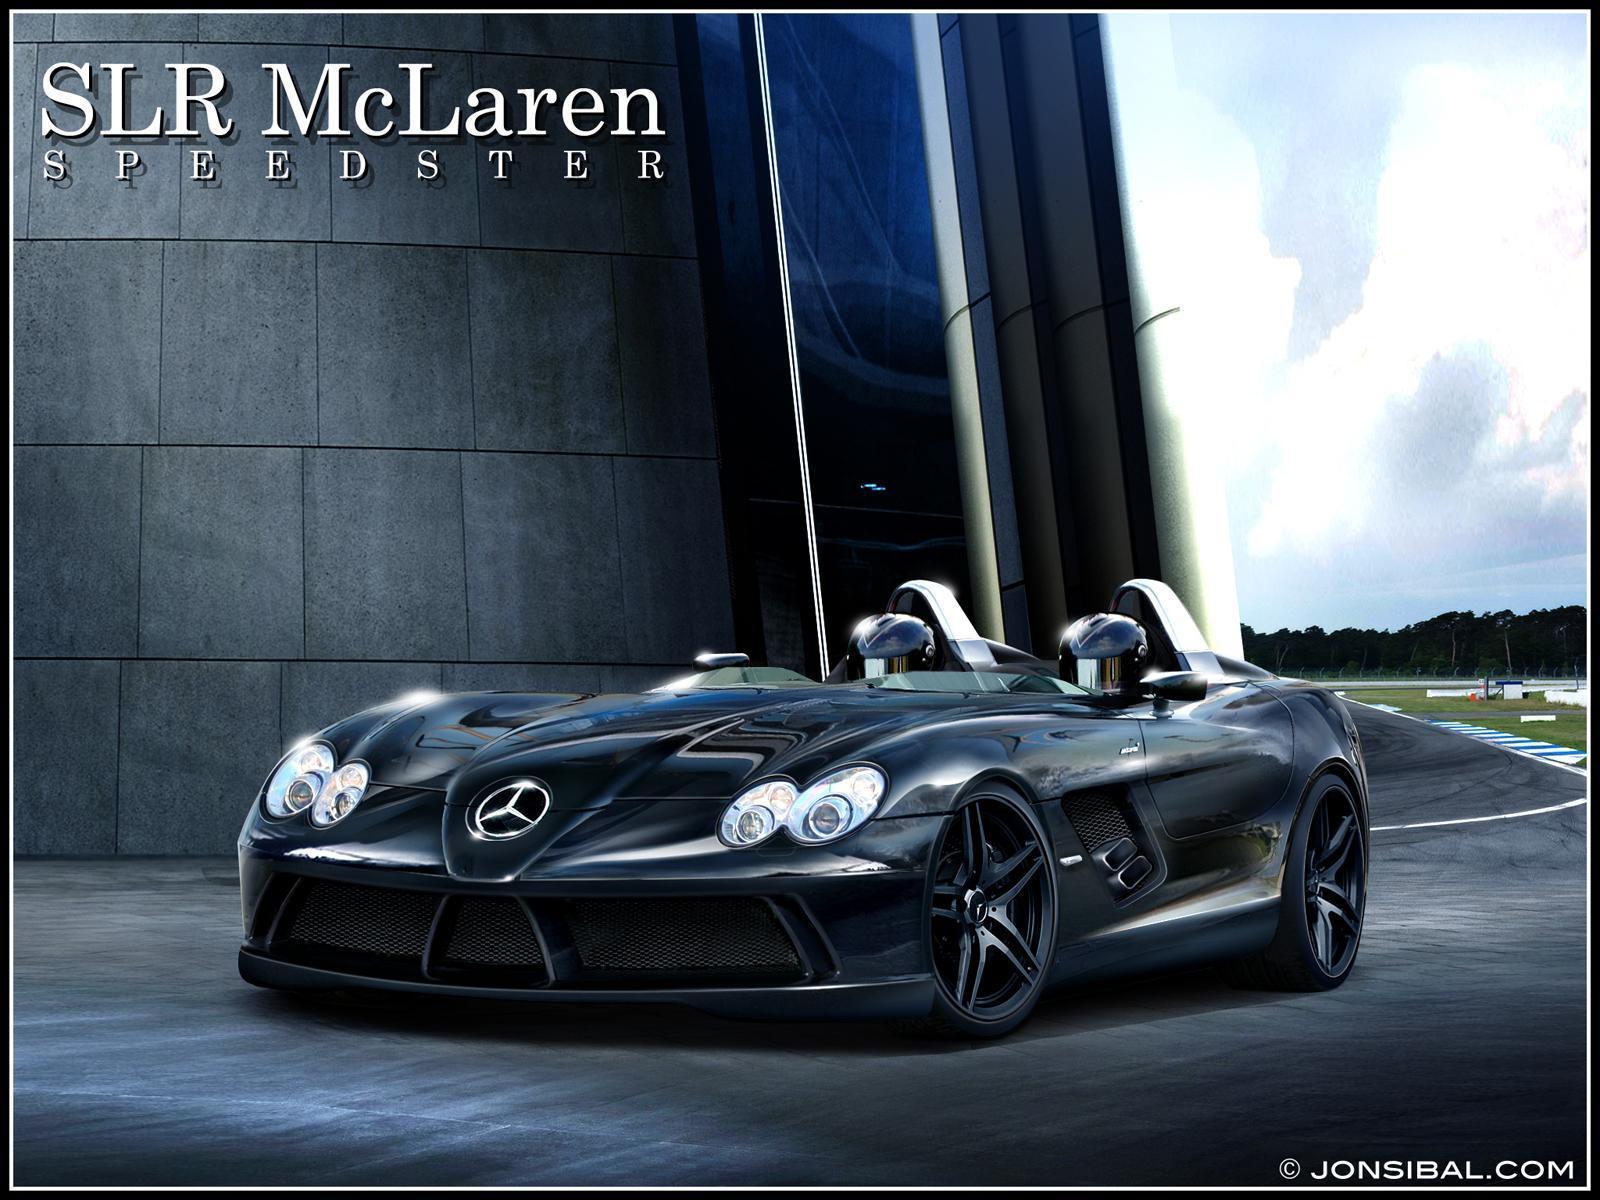 Mercedes Benz Images Mercedes Benz Slr Mclaren Speedster Par